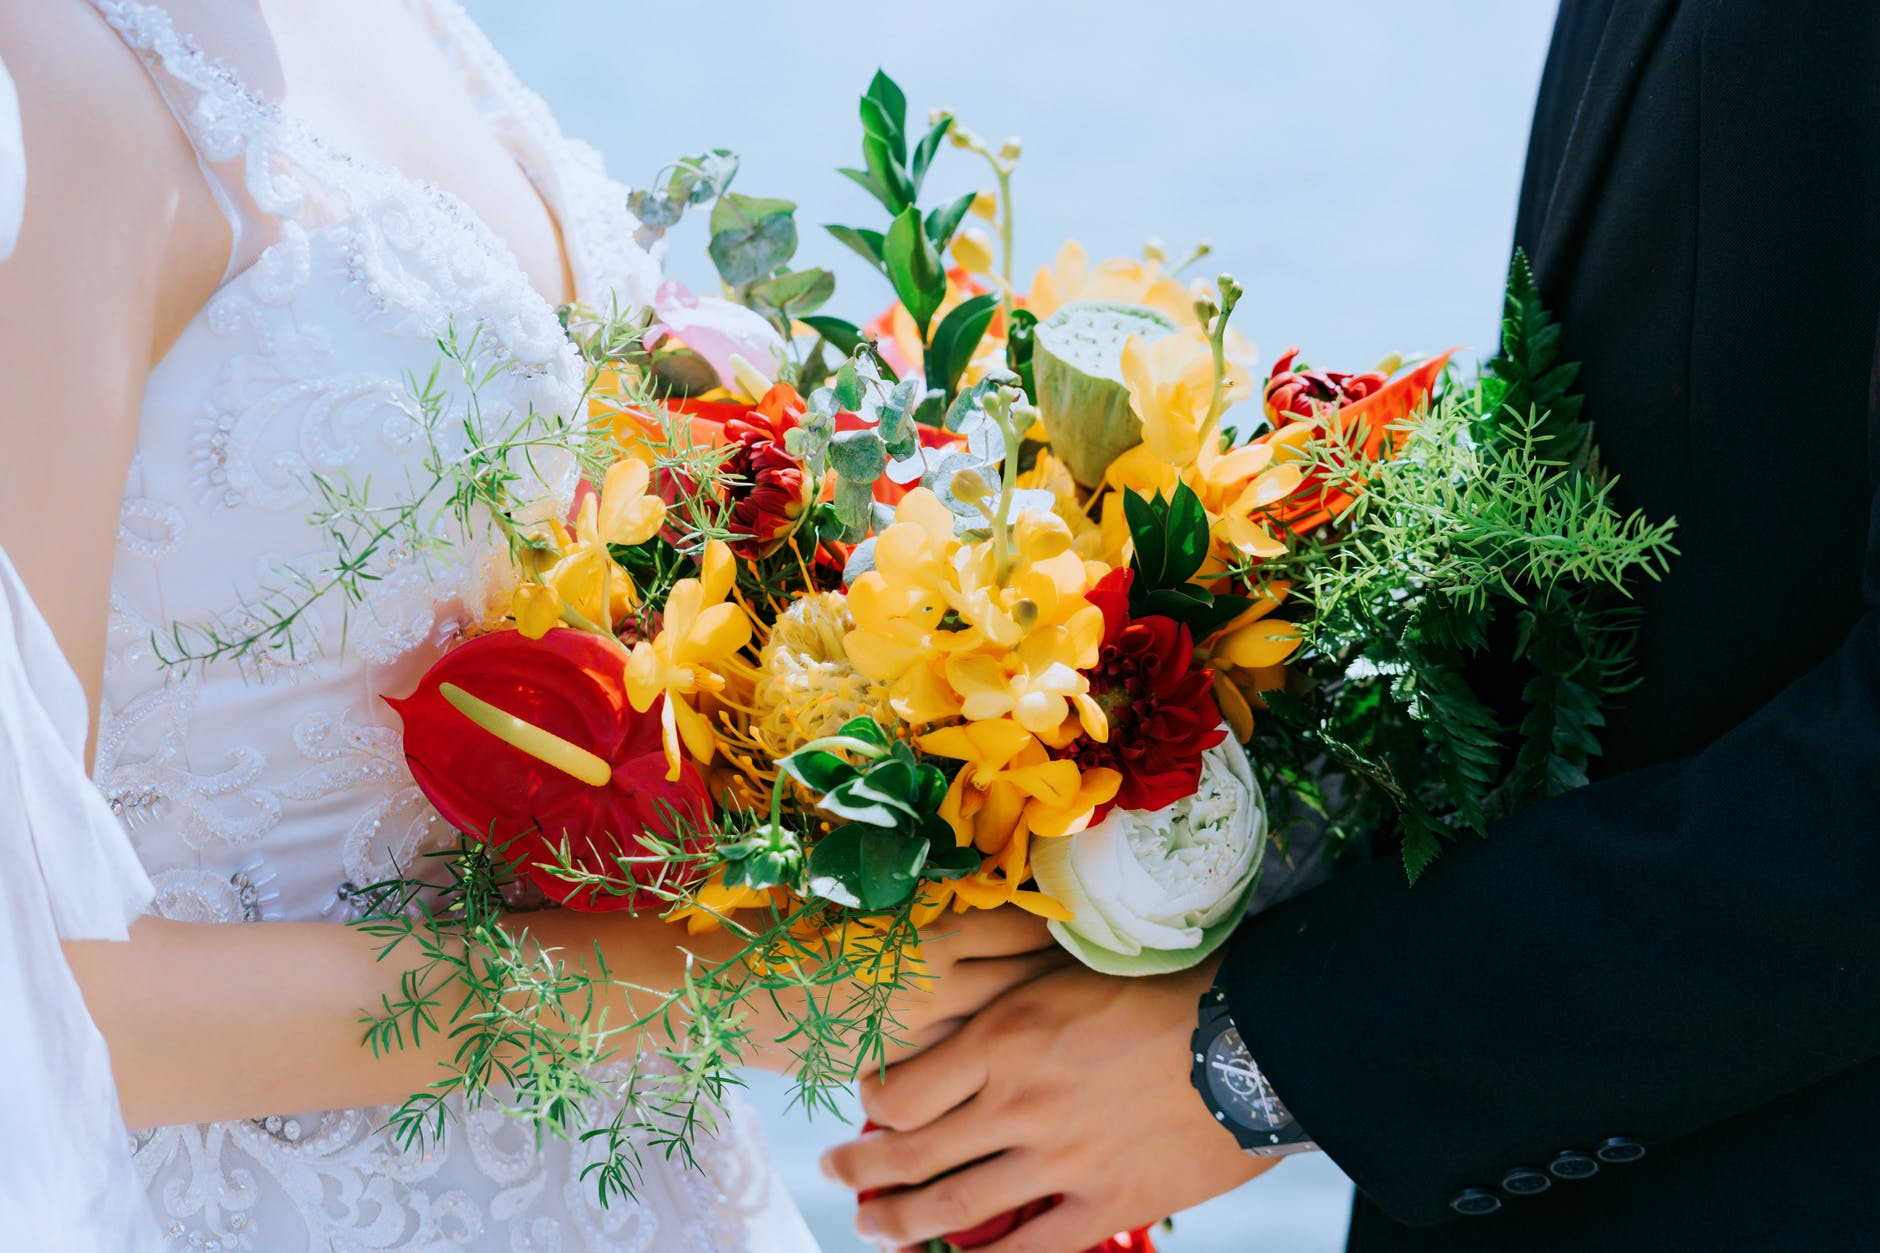 Eastern European bride